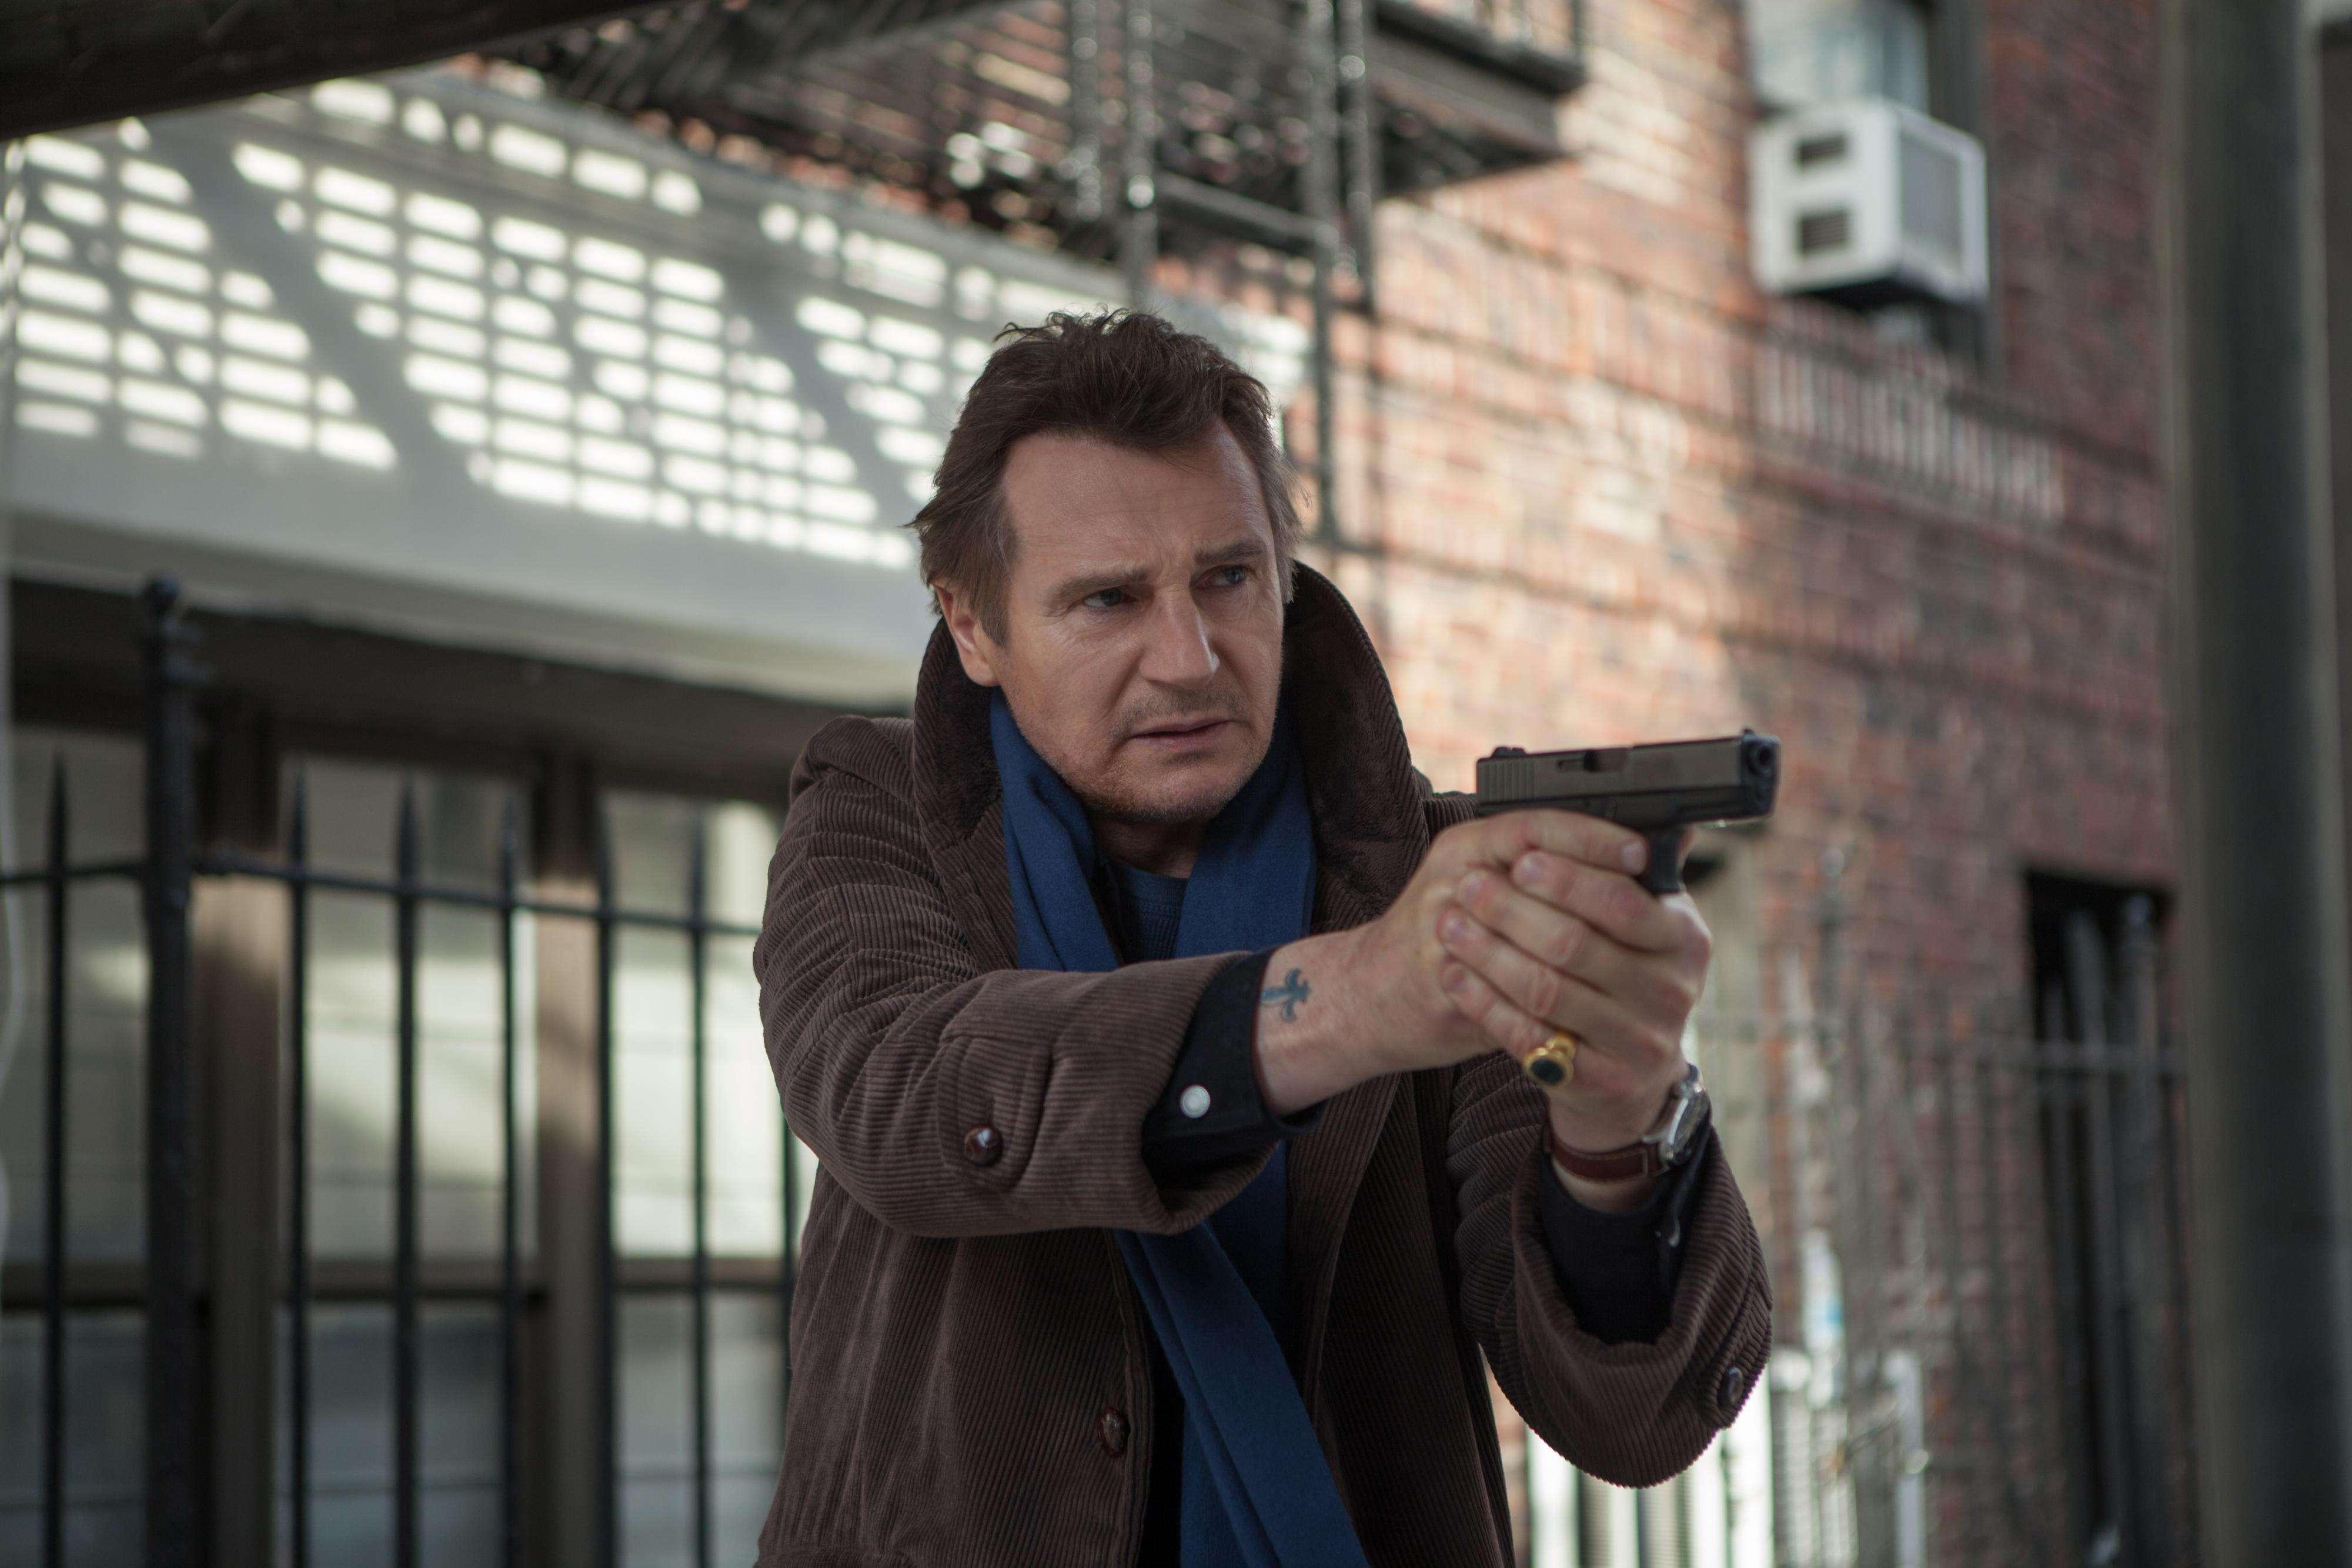 Liam Neeson interpretó al detective Matt Scudder en 'Caminando Entre Tumbas'. Foto: Caminando Entre Tumbas